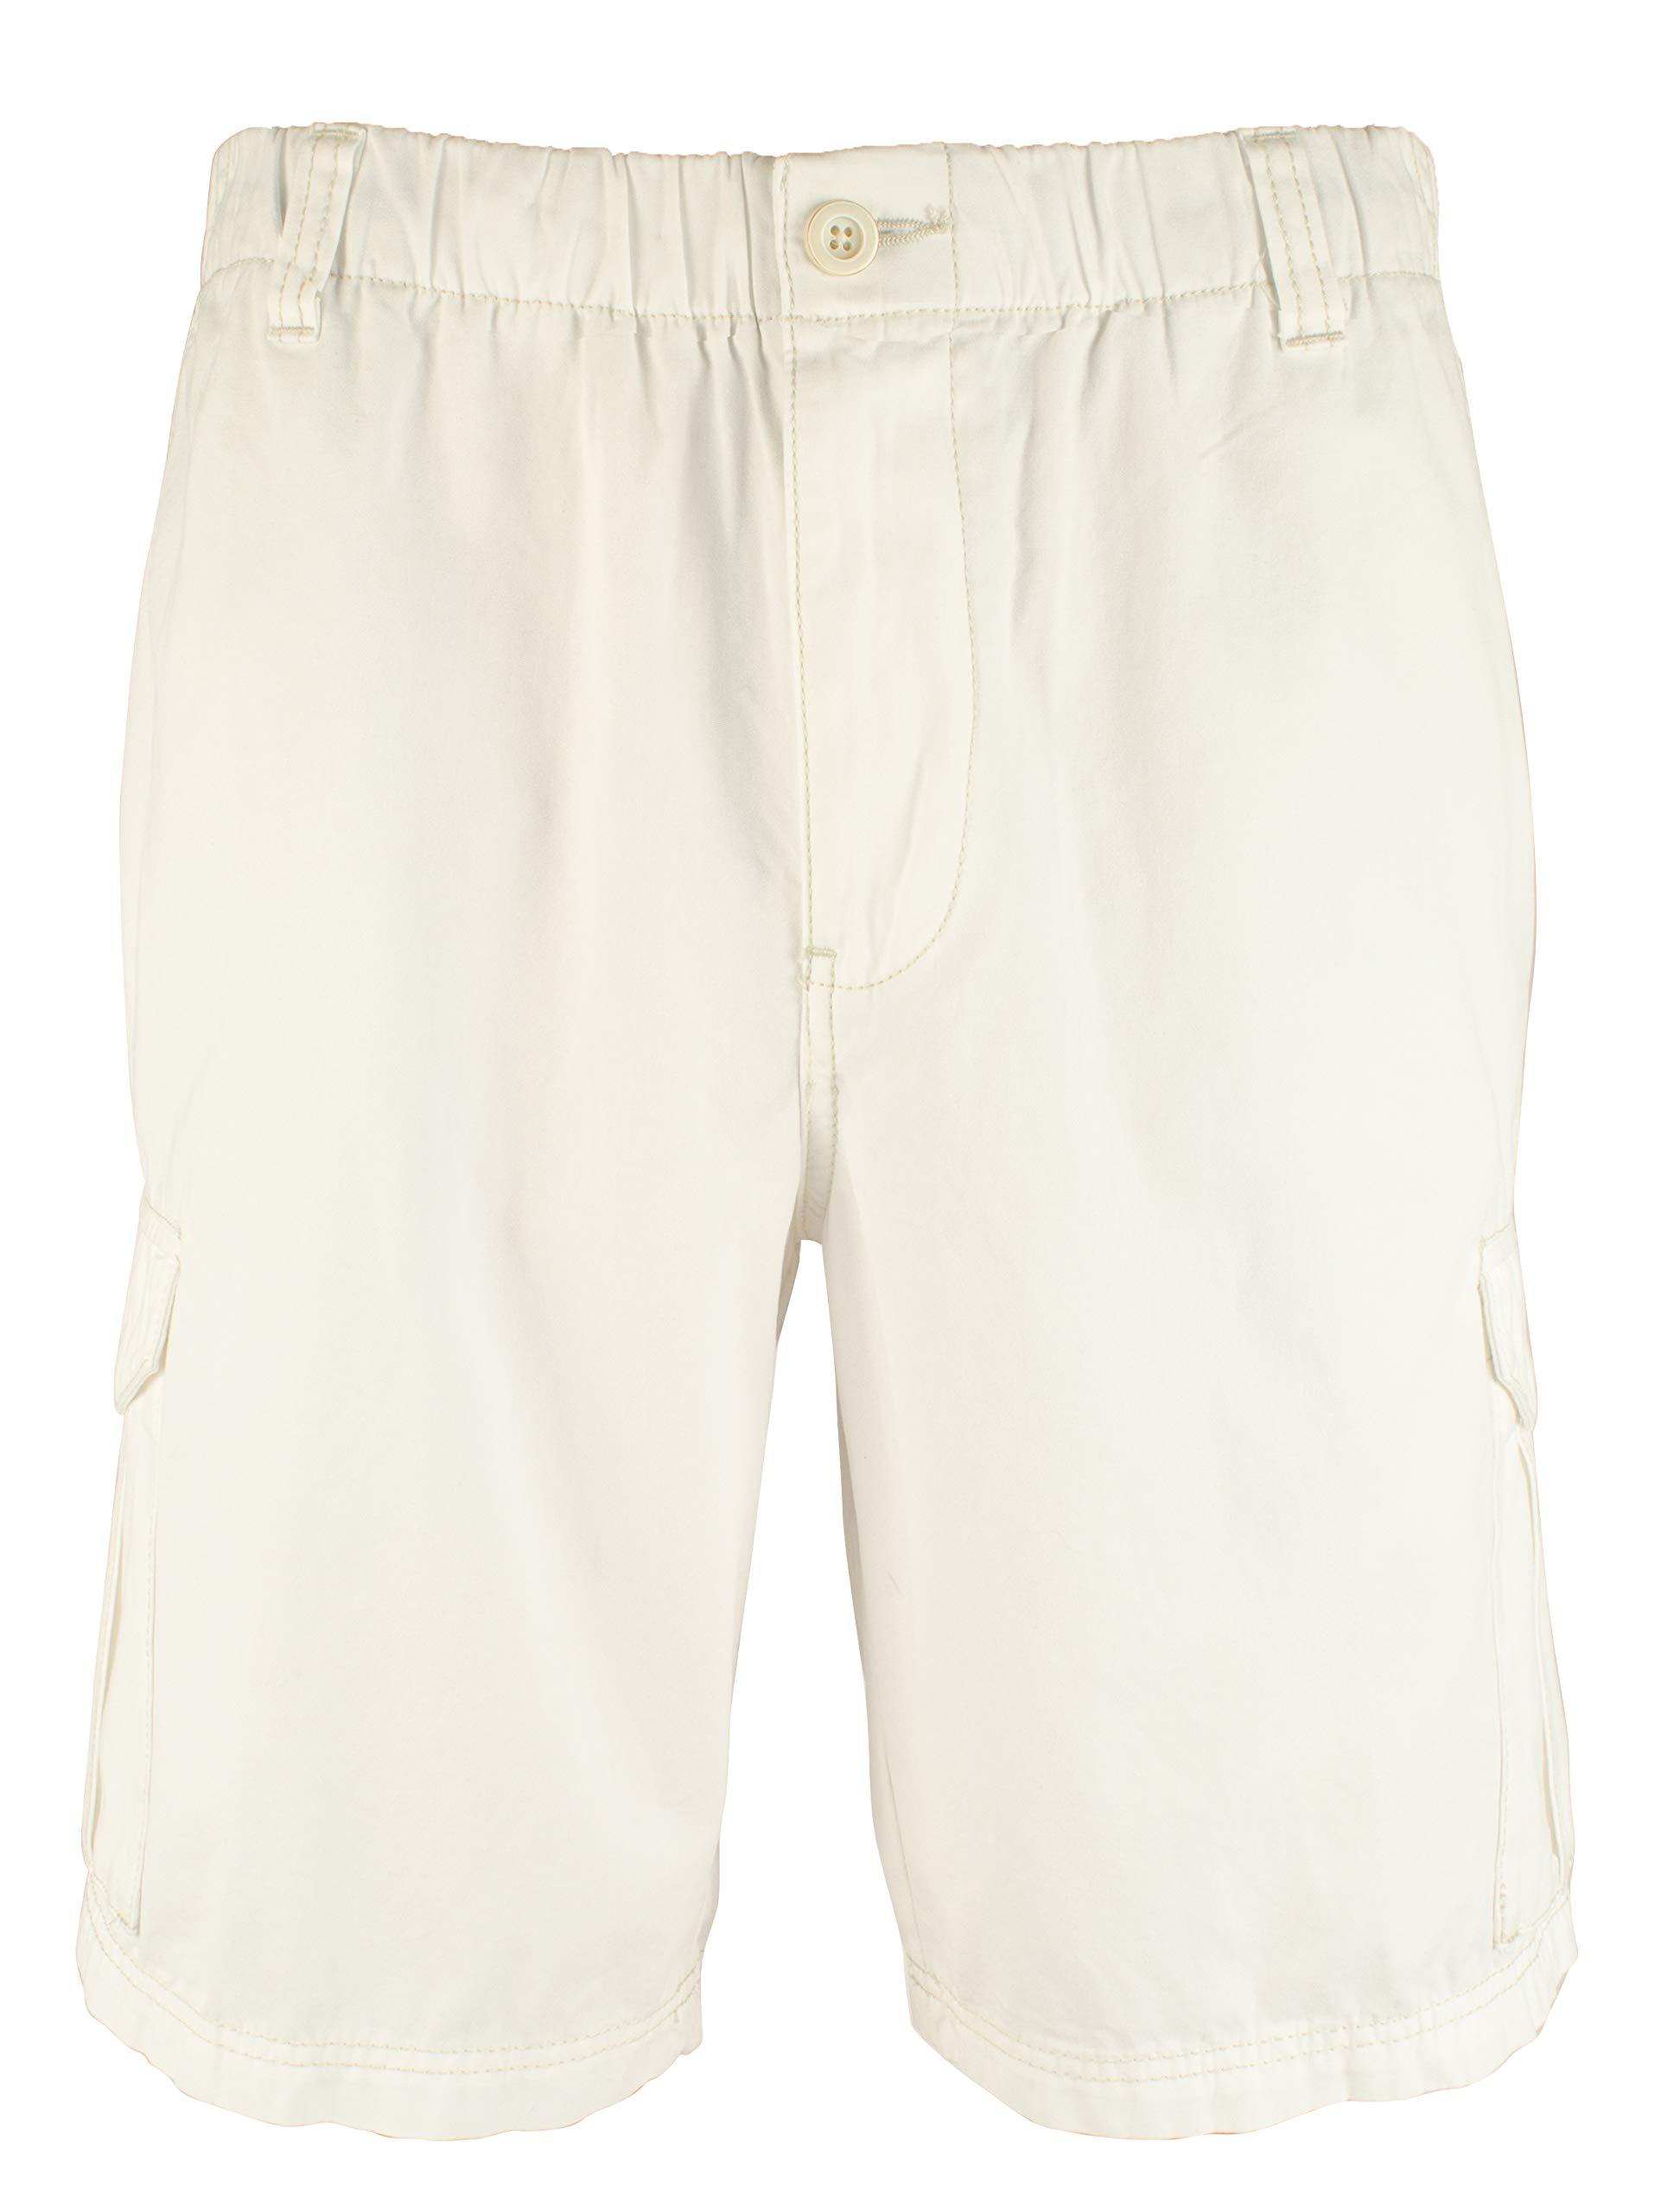 Tommy Bahama Big & Tall Men's Big & Tall Island Survivalist Cargo Shorts Coconut 3XB 9.5 9.5